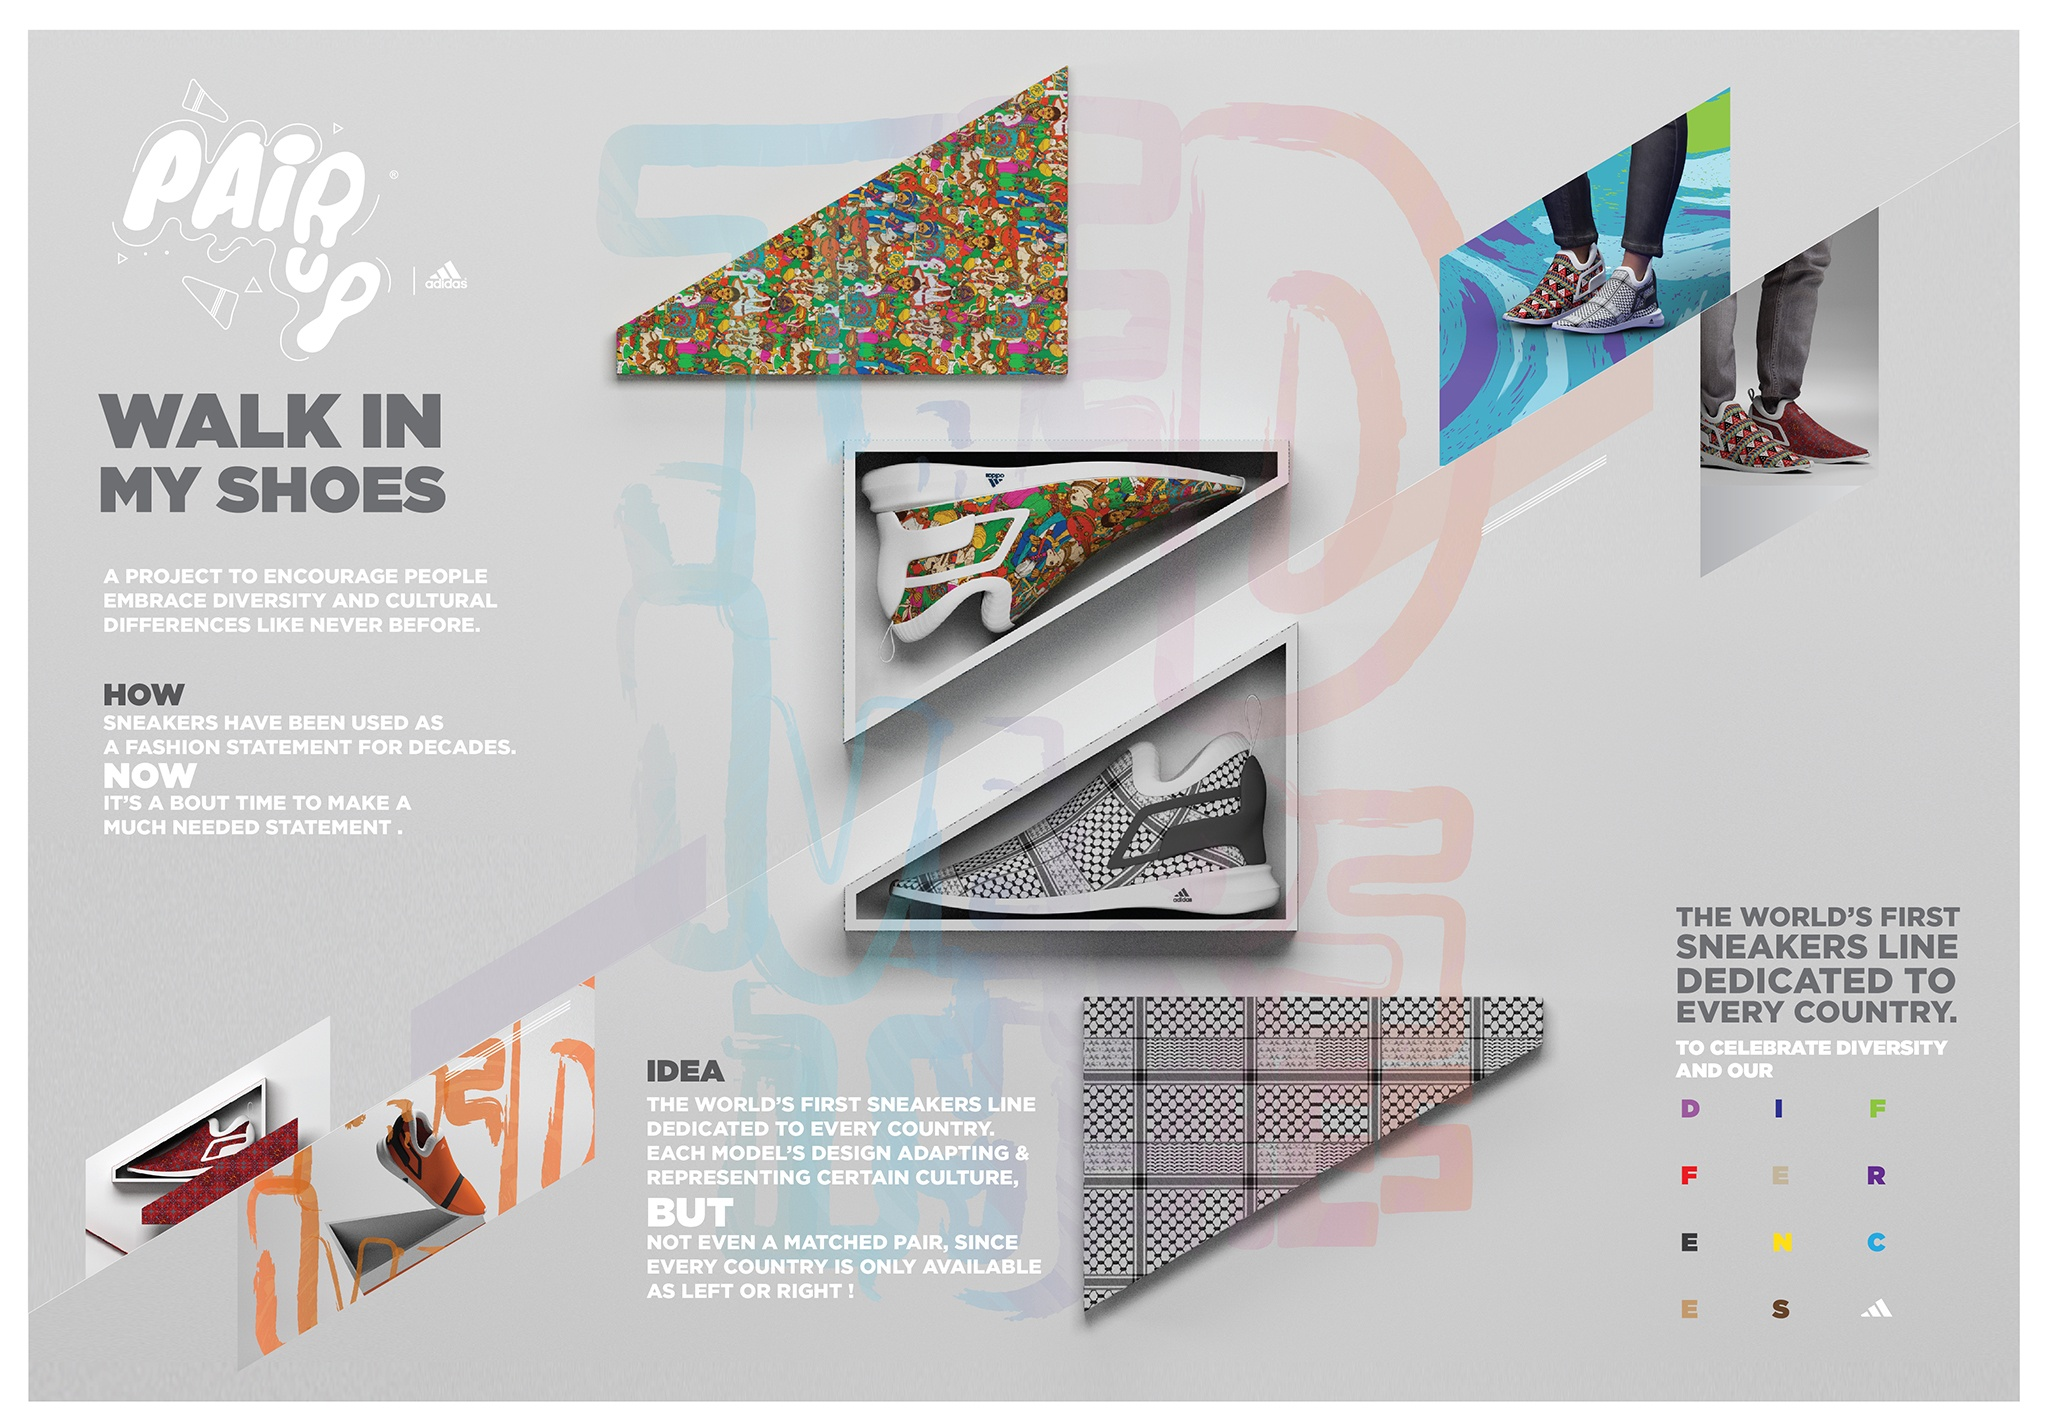 Thumbnail for Adidas - PairUp-WalkInMyShoes